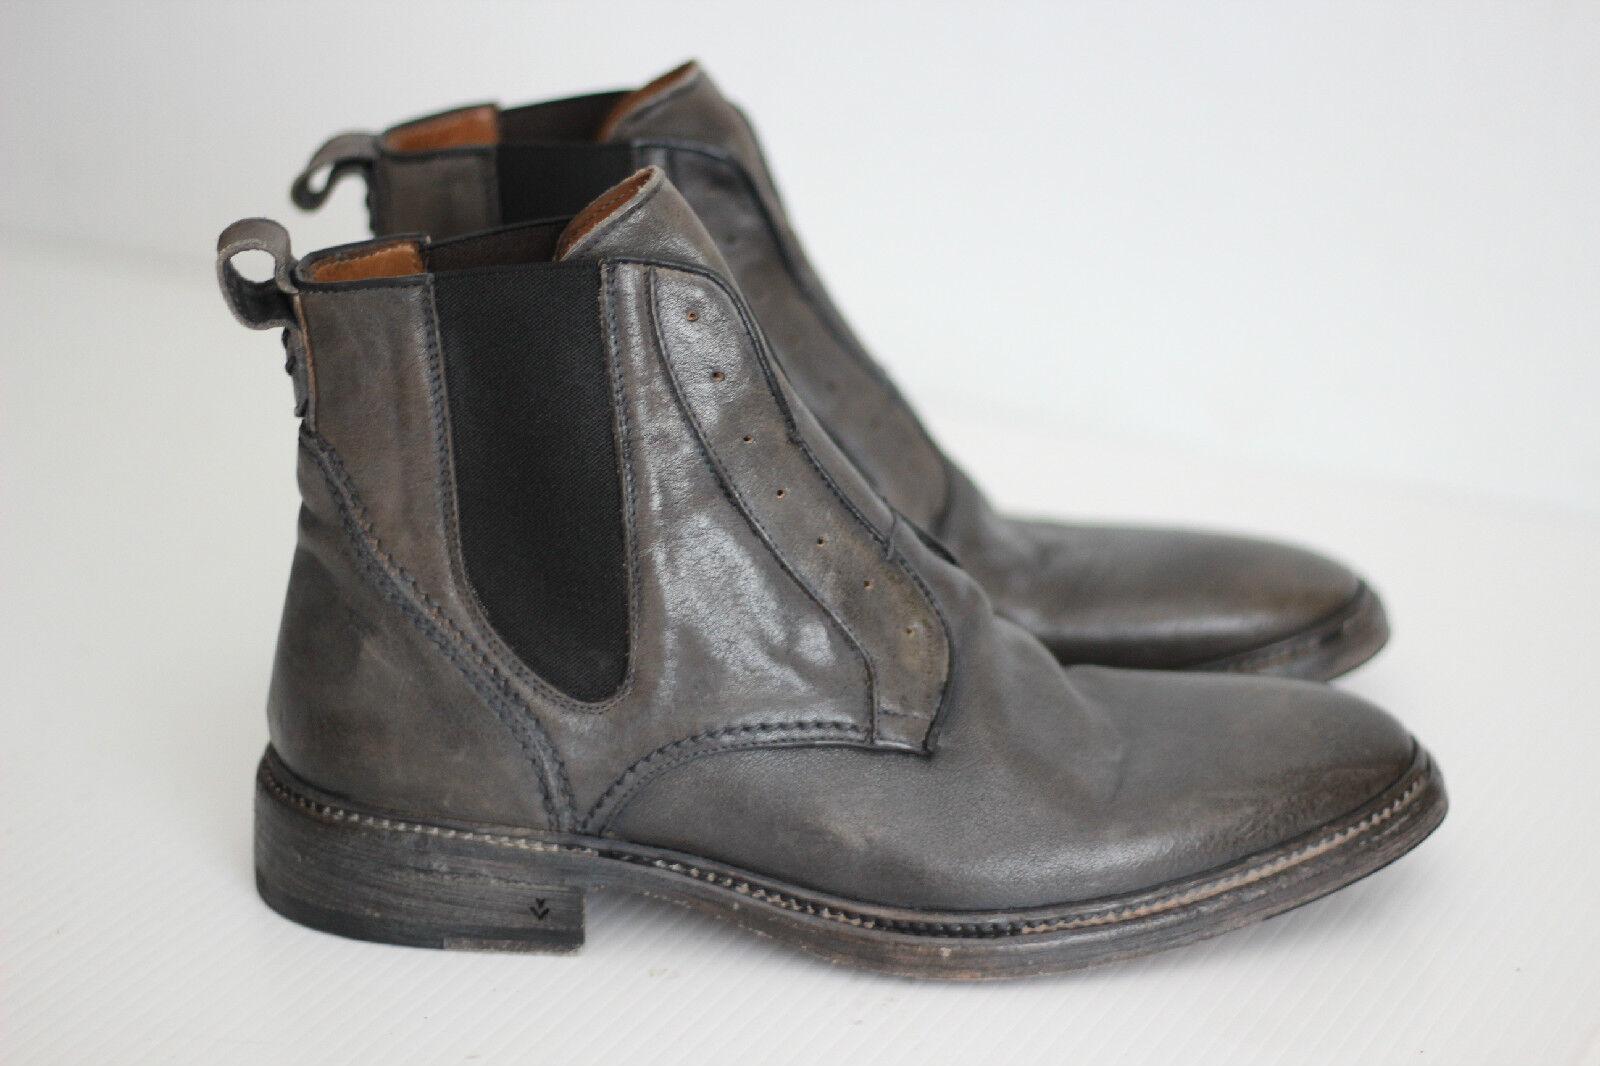 Para Hombre John Varvatos Fleetwood noruego Chelsea Bota De Cuero gris (X48)